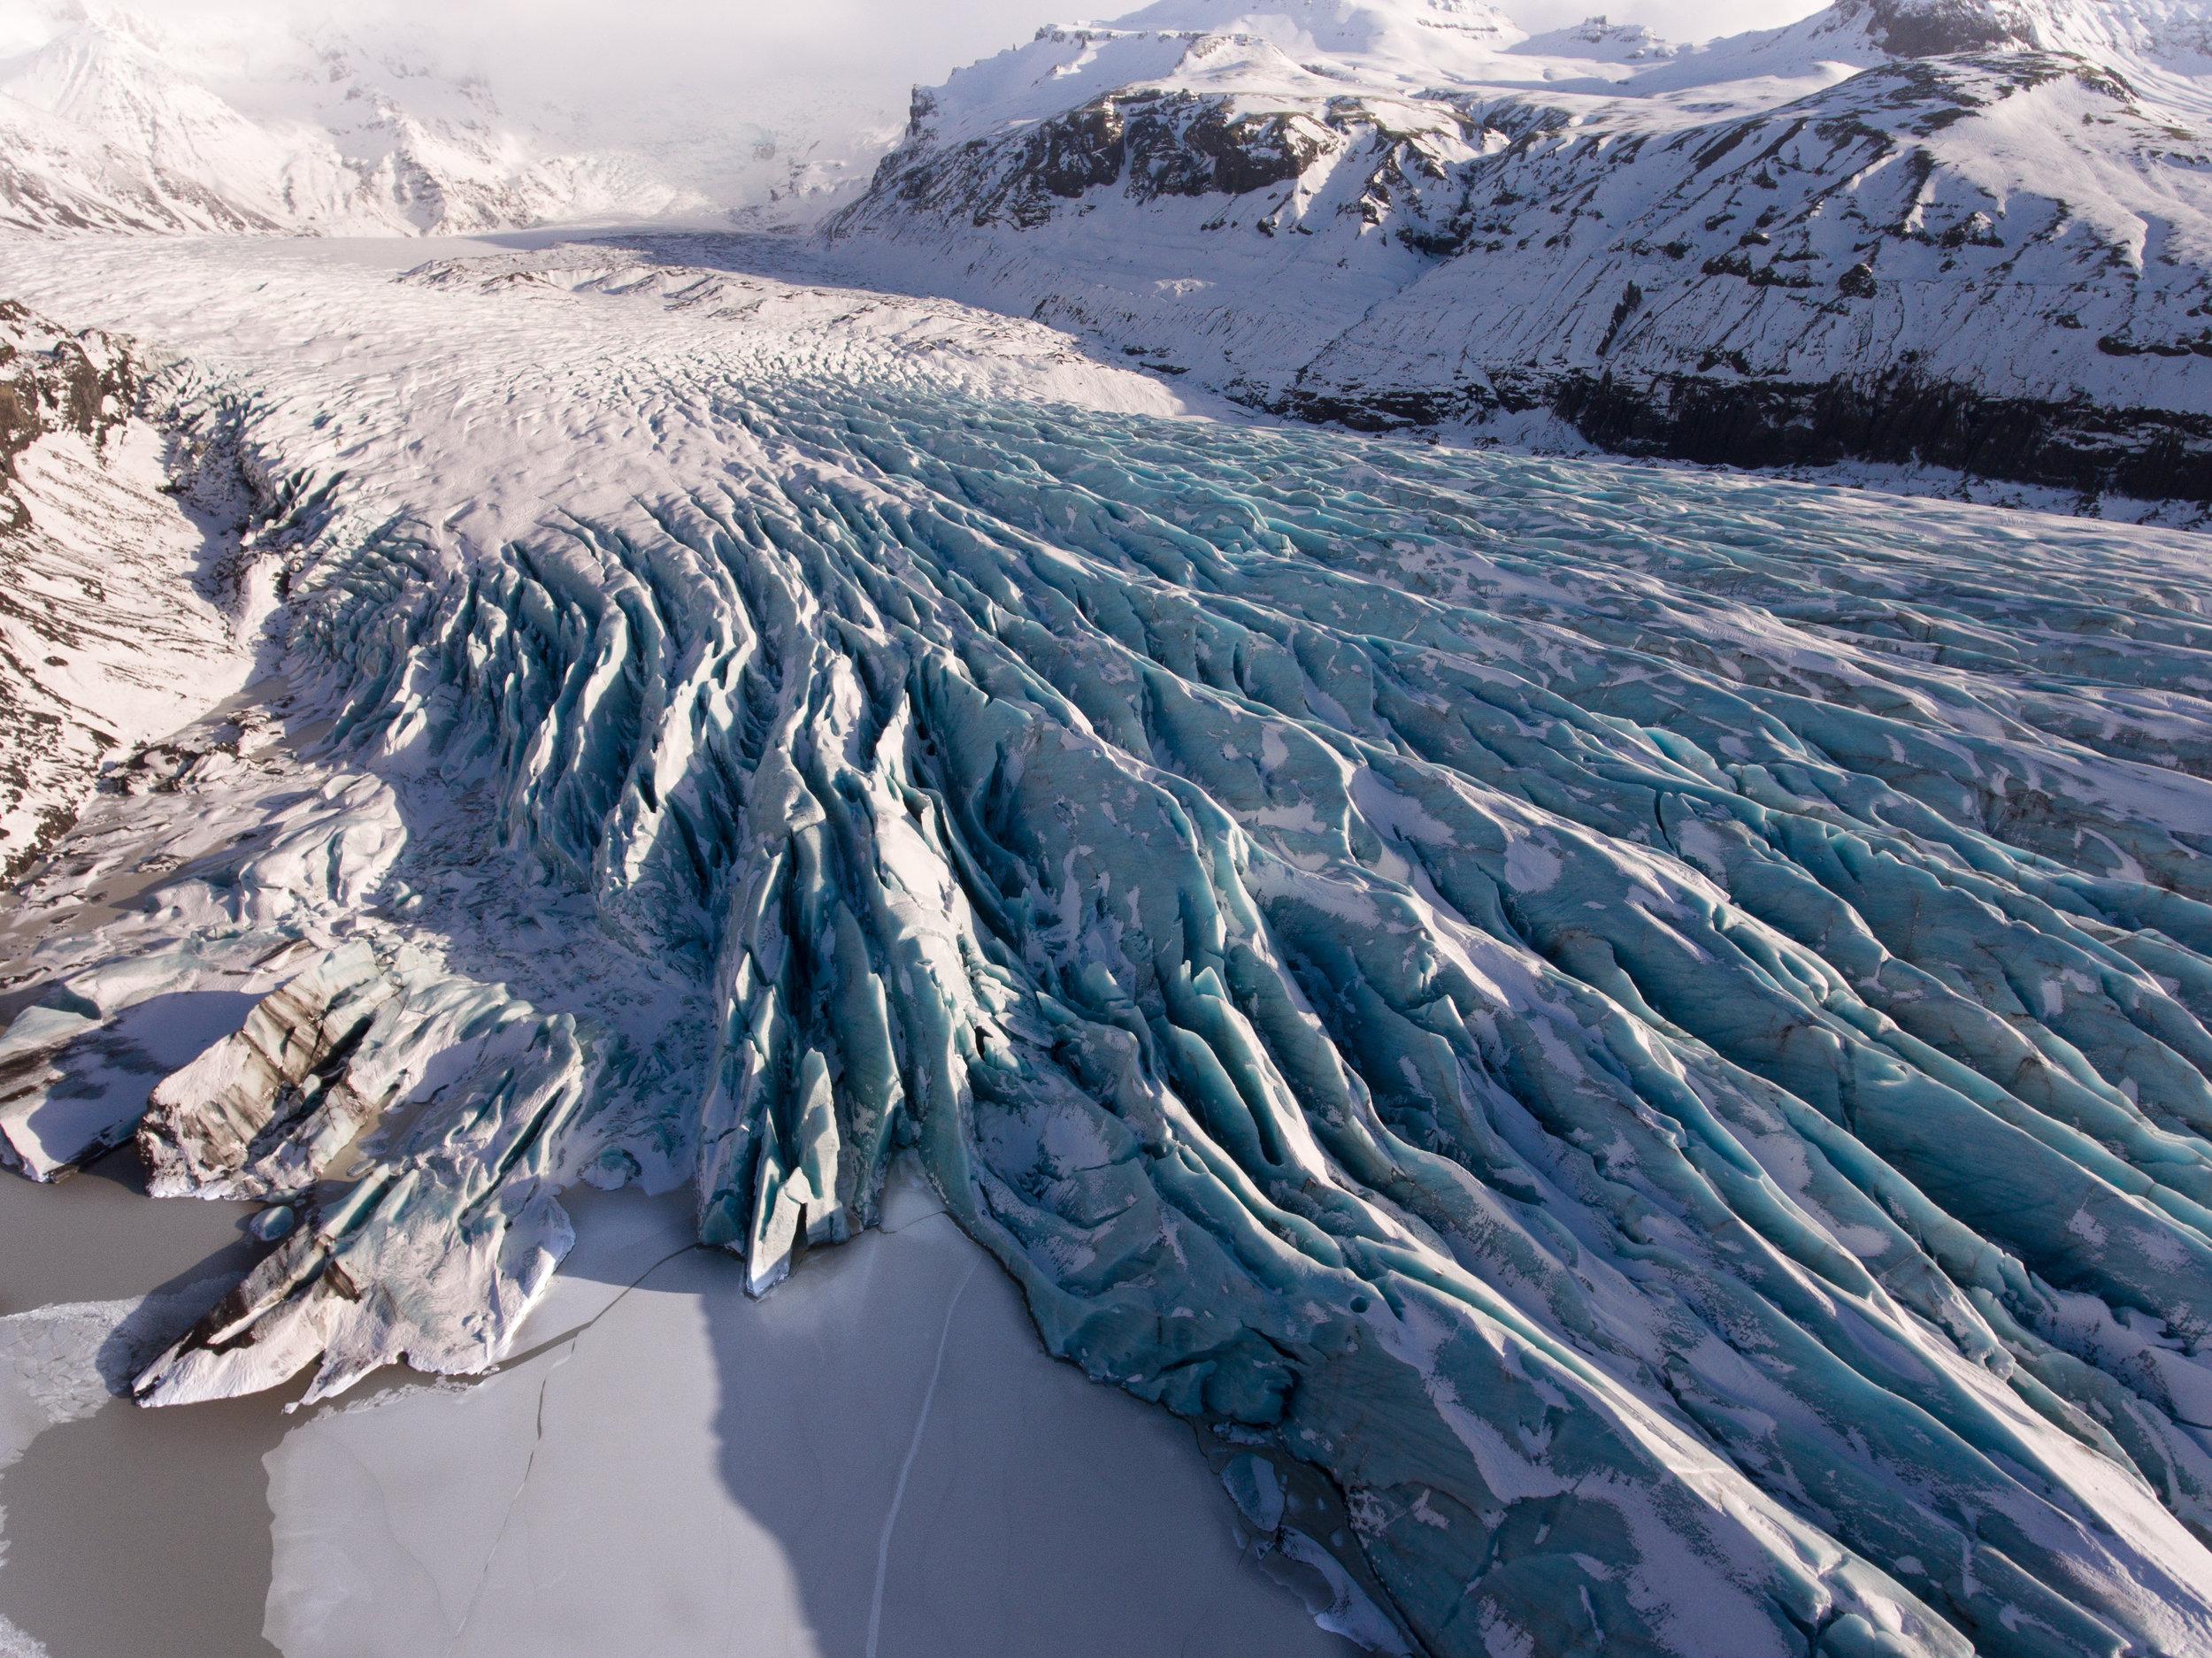 jermiah-schuster-iceland-458.jpg